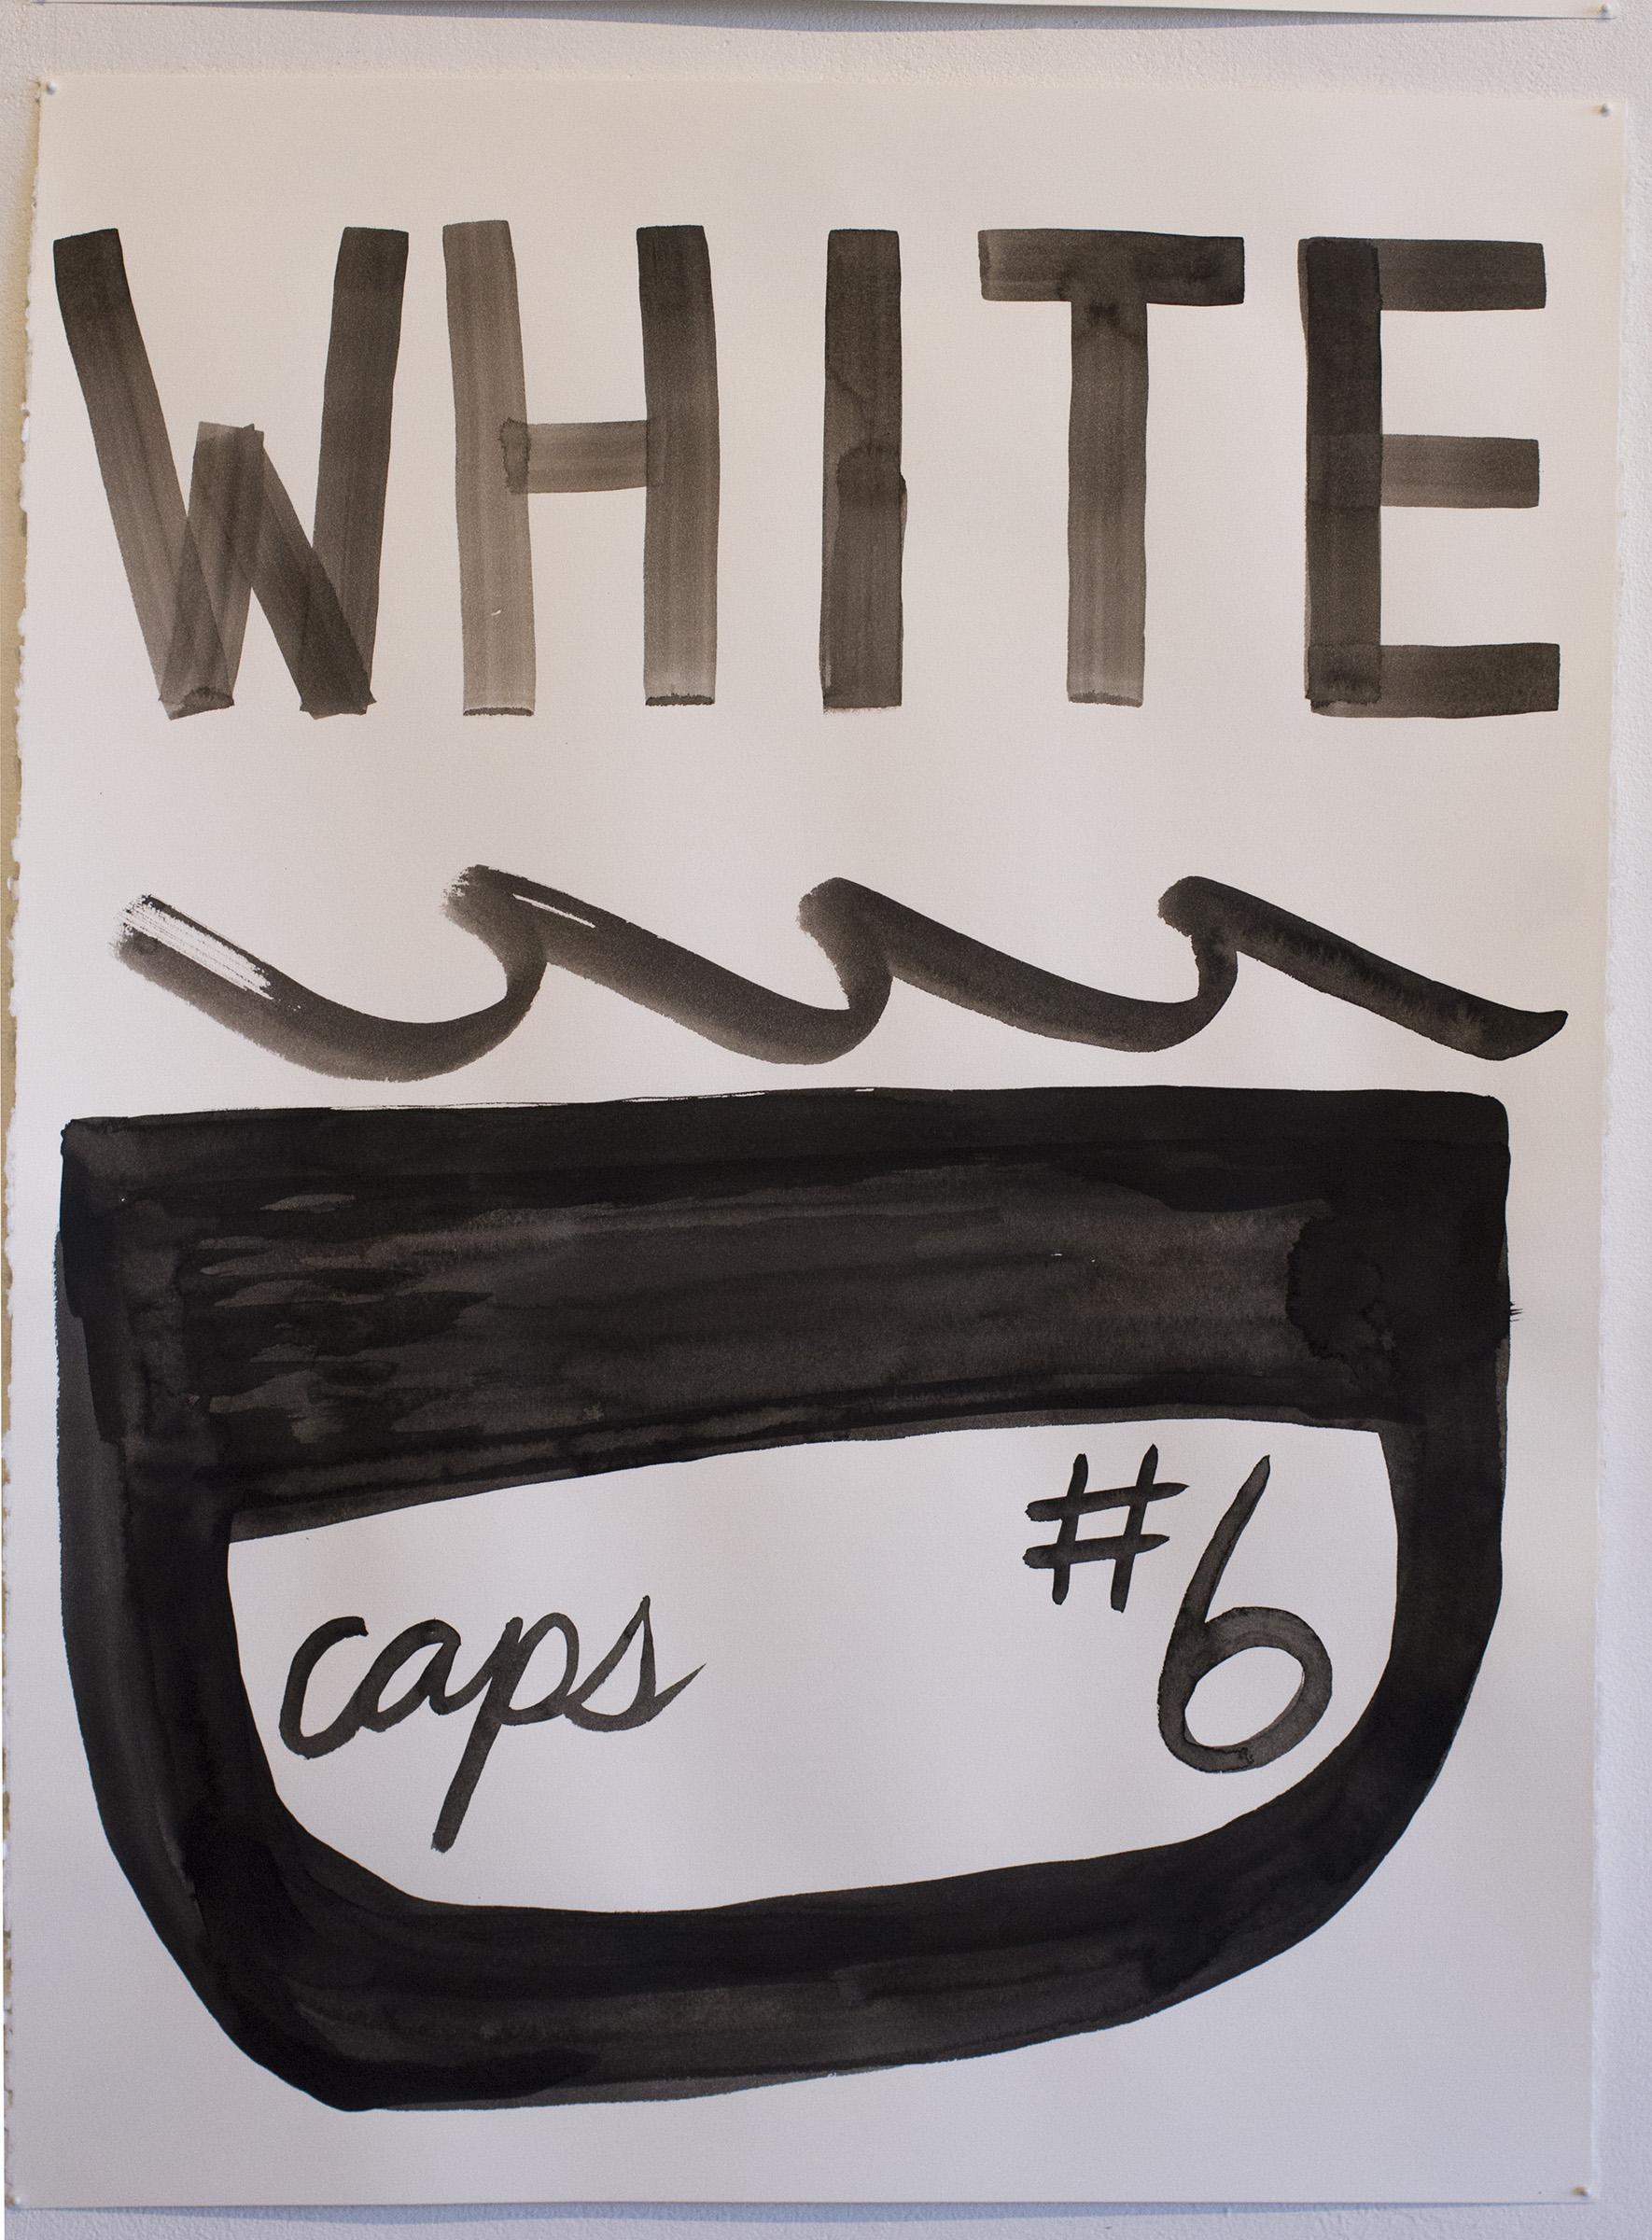 Cooper #6 white caps.jpg